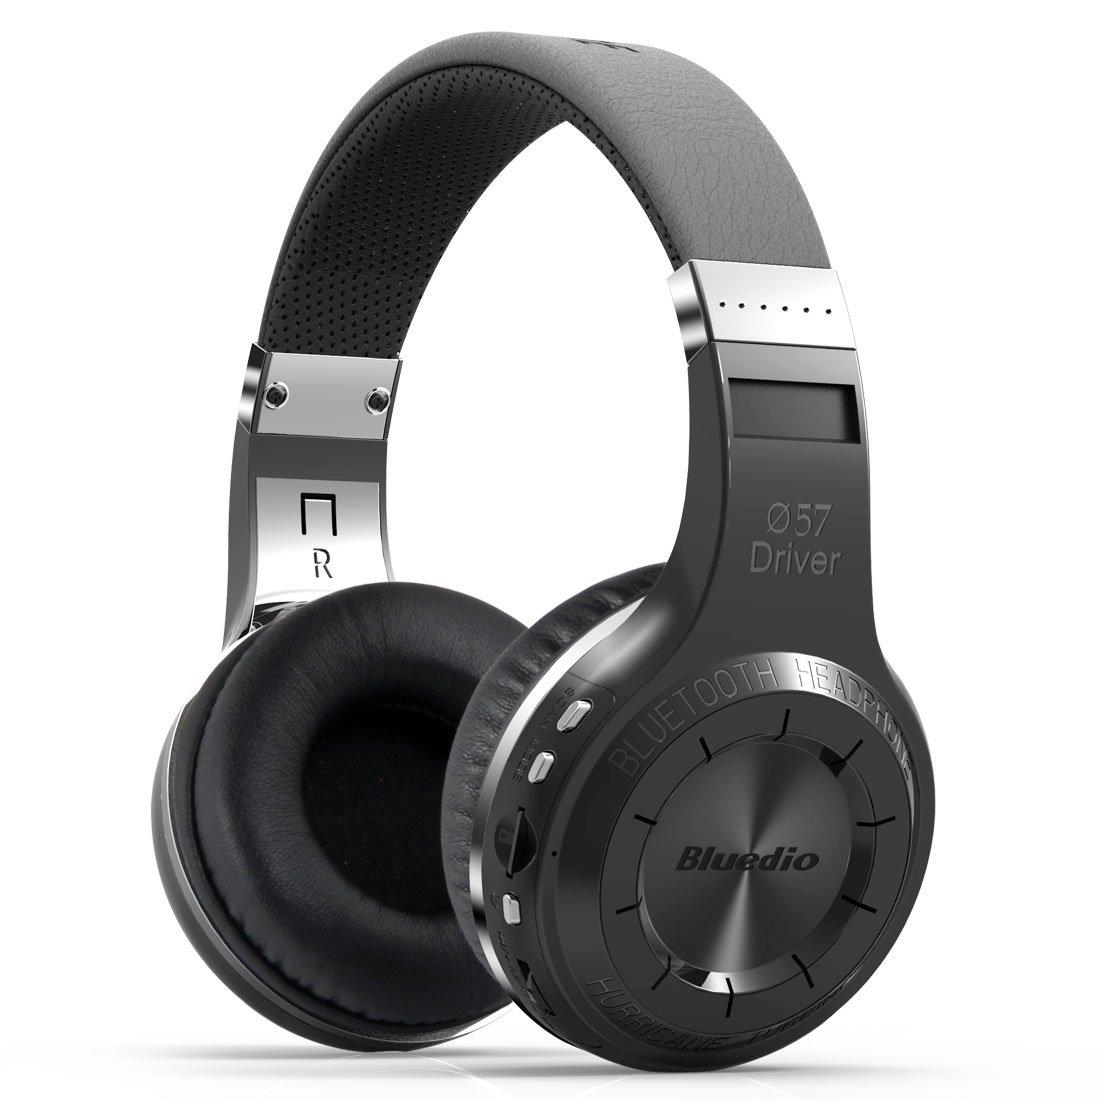 Bluedio H Turbine Bluetooth 41 Stereo Wireless Cck Ks Original Headphones Hifi With Bulit In Microphone Noise Cancelling Electronics